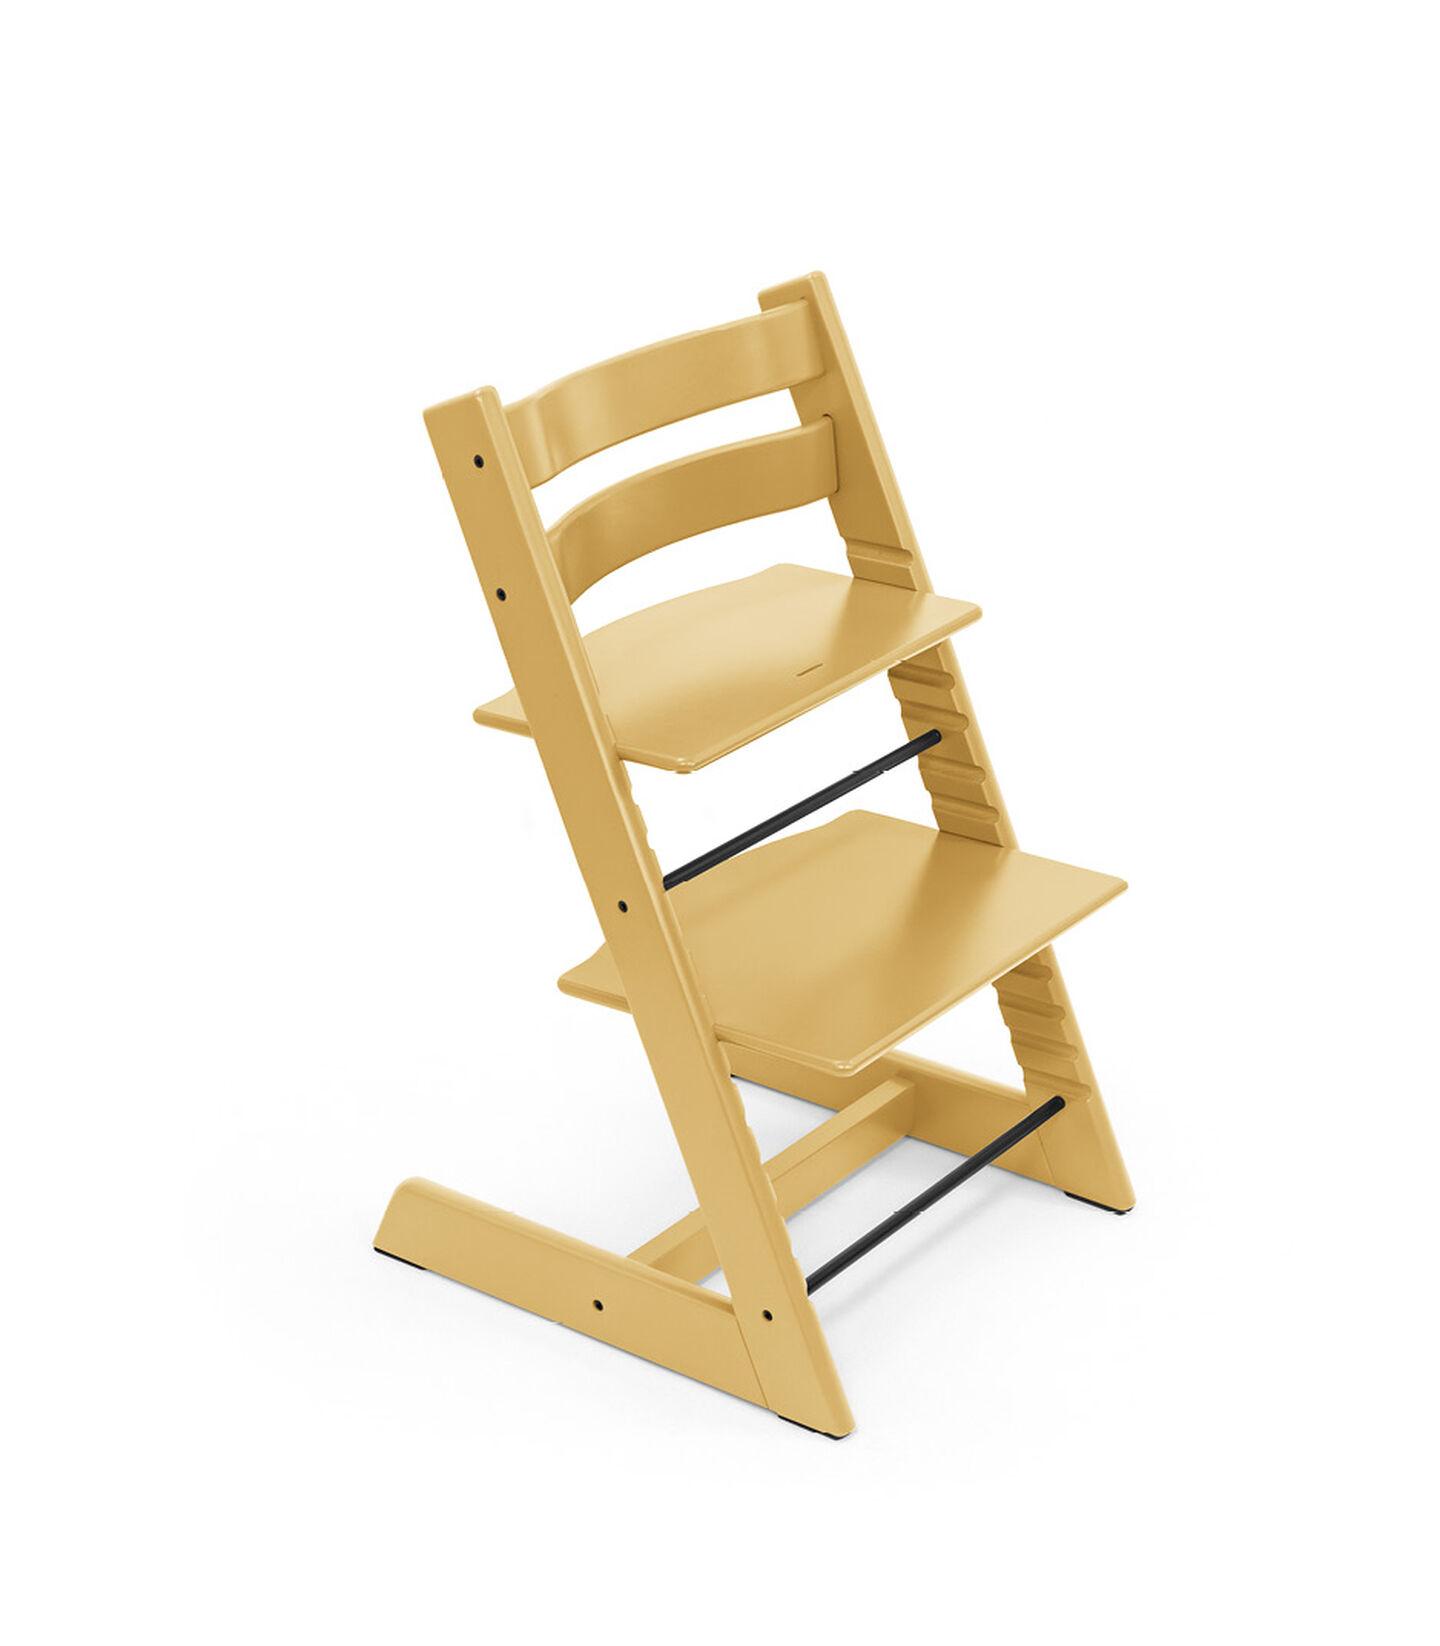 Tripp Trapp® Chair Sunflower Yellow, Sunflower Yellow, mainview view 1